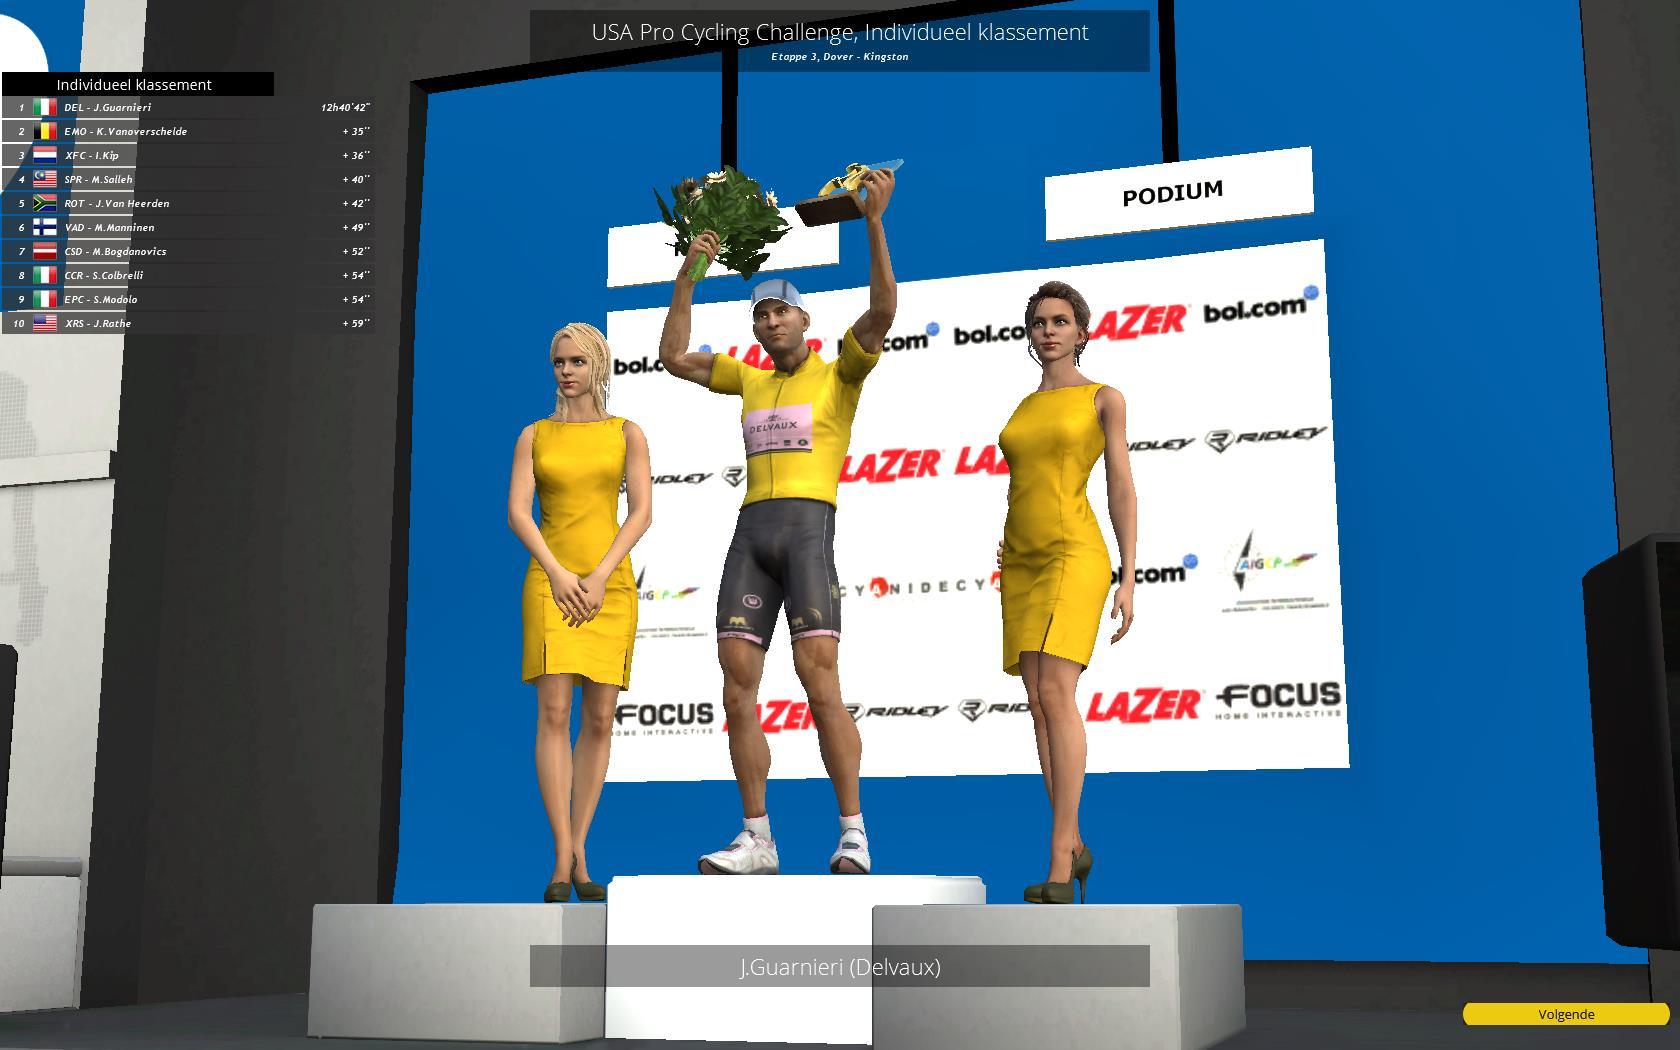 pcmdaily.com/images/mg/2018/Races/C2/USAPCC/3/PCM0015.jpg